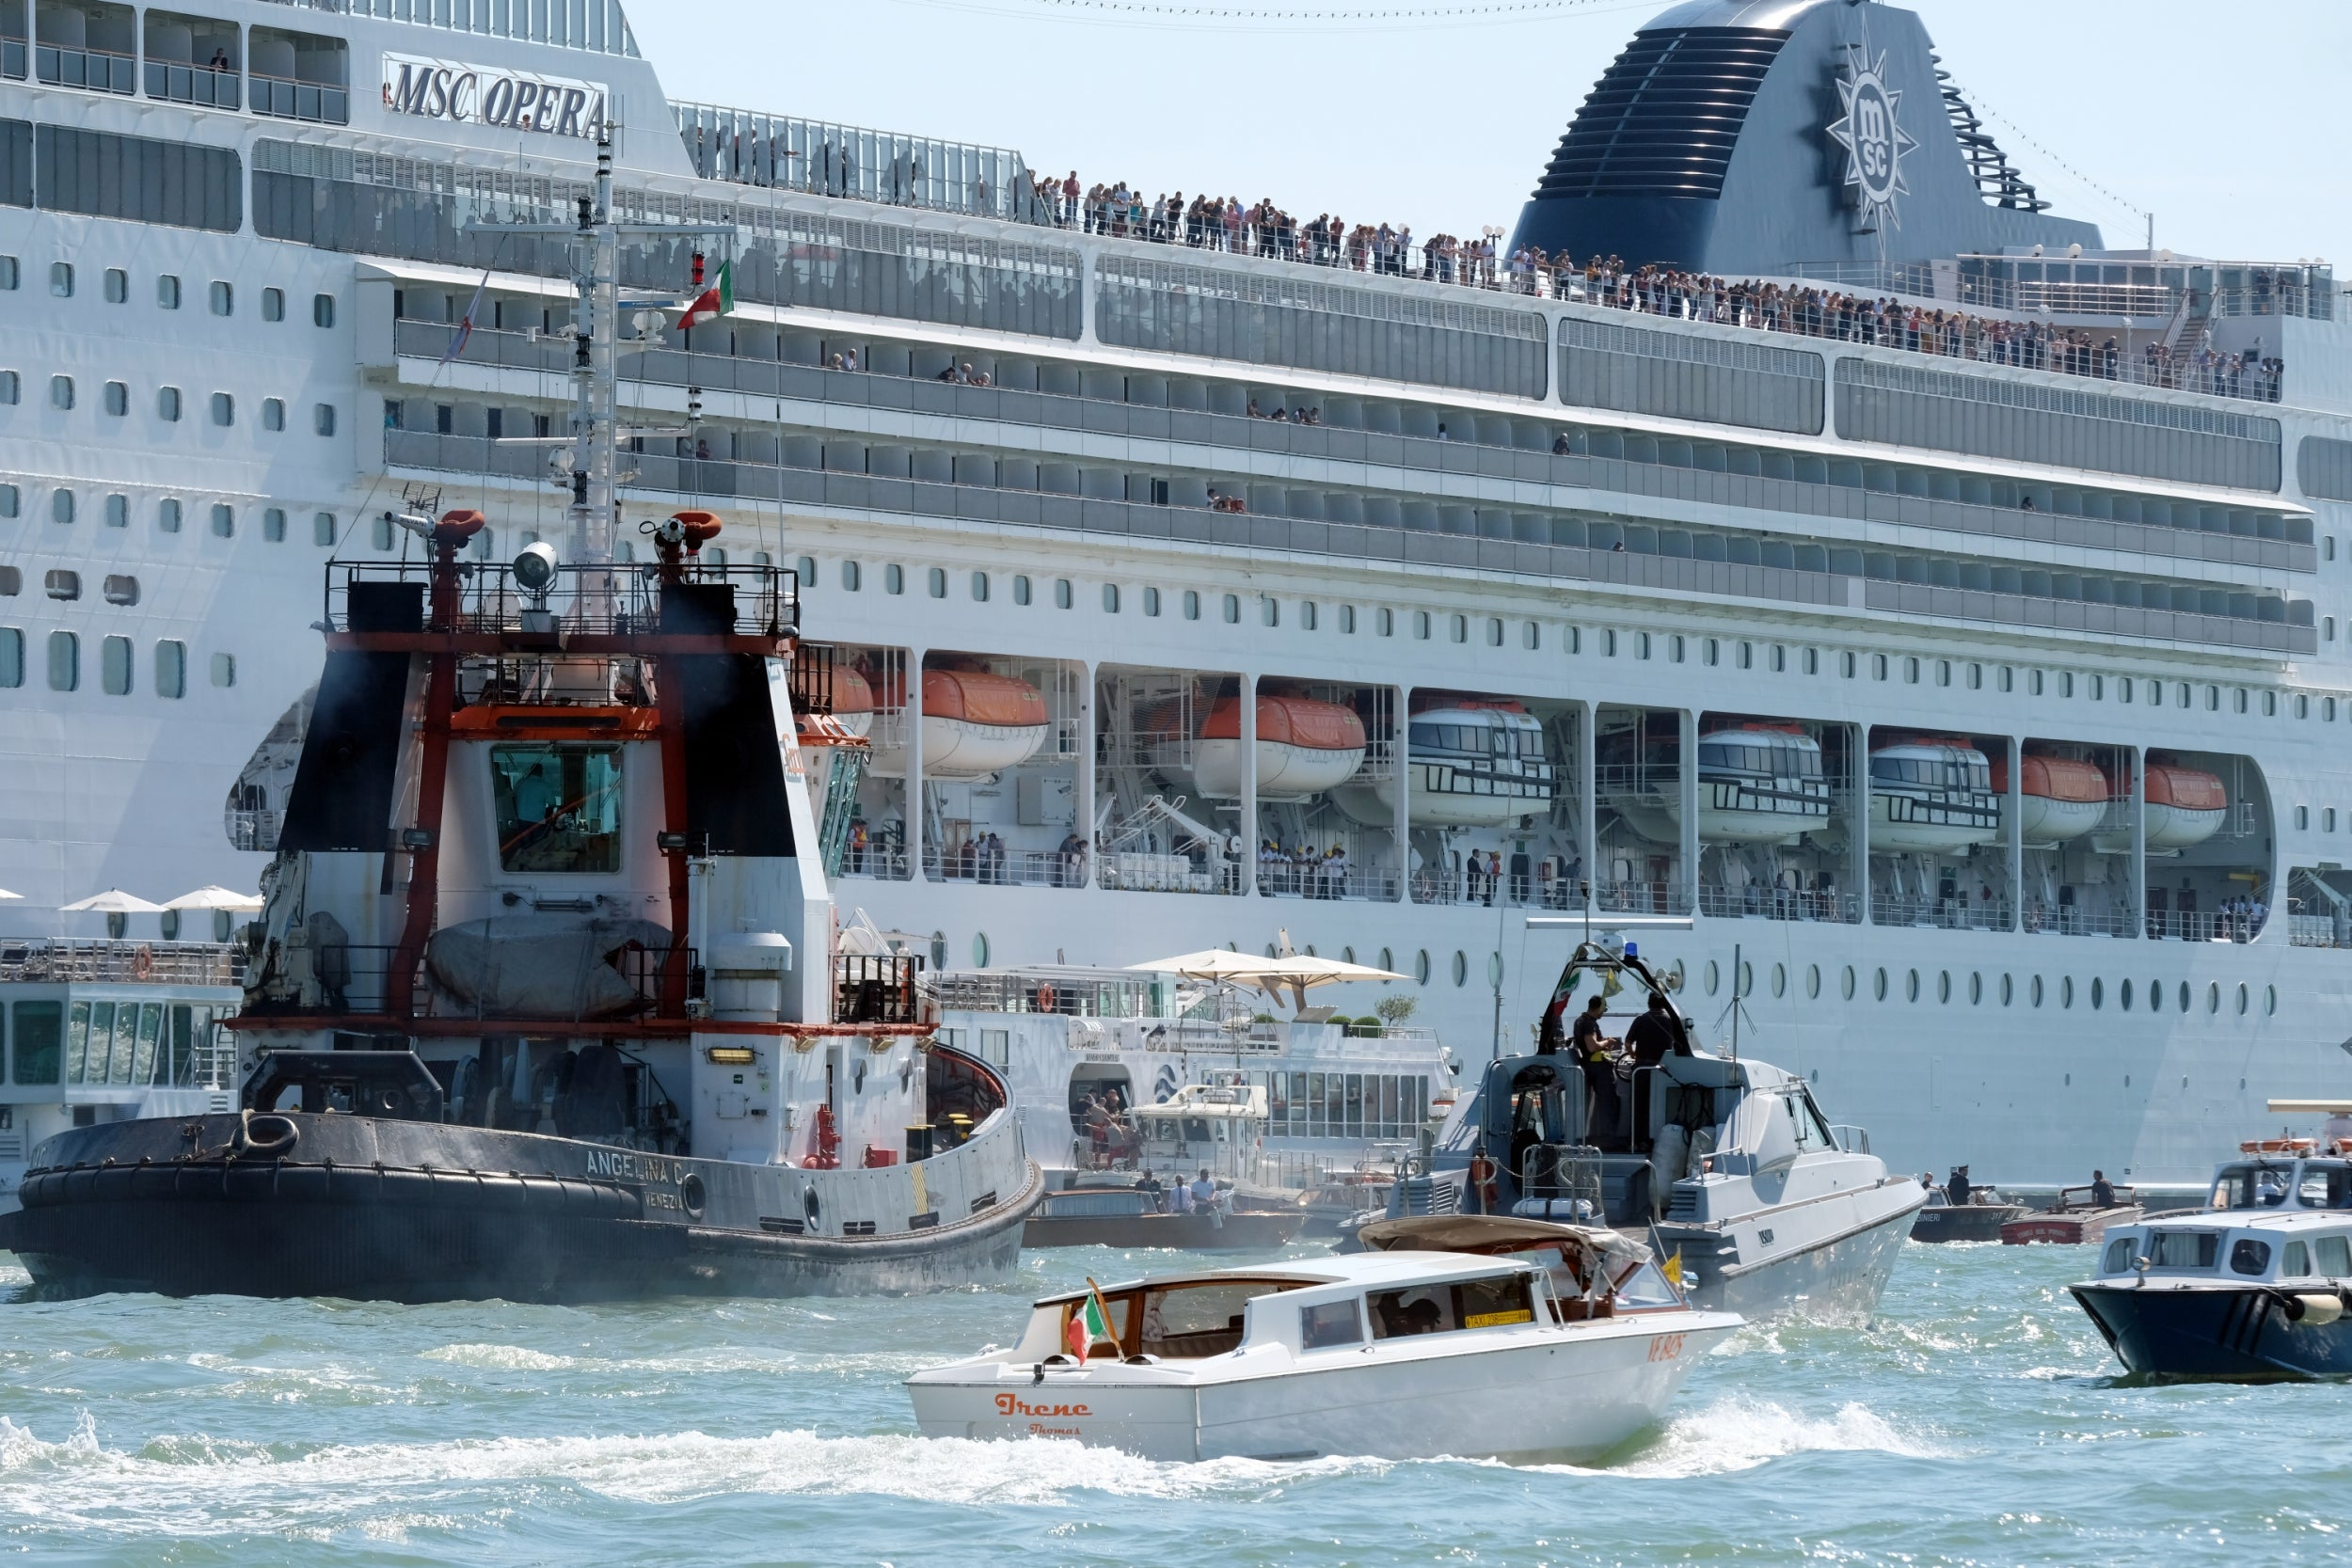 Venice cruise ship crash: Four injured as MSC Opera liner